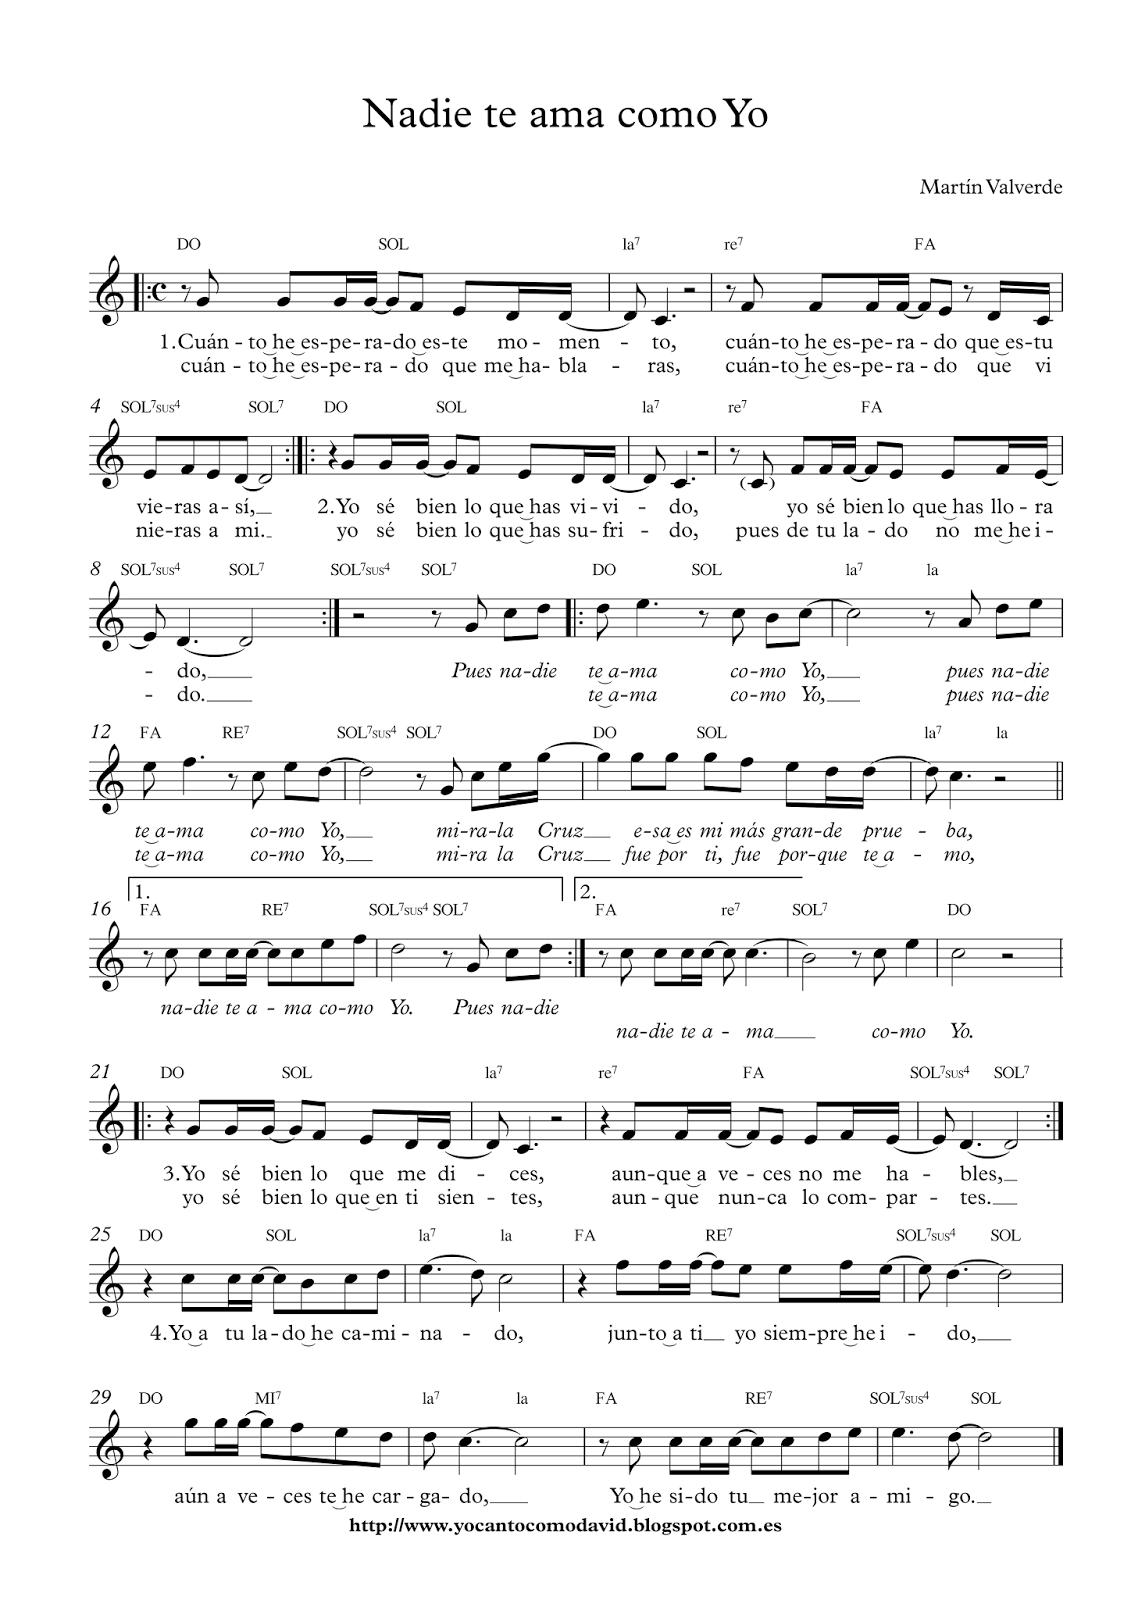 Nadie Te Ama Como Yo Yo Canto Como David Partituras Musica Partituras Teclados Musicales